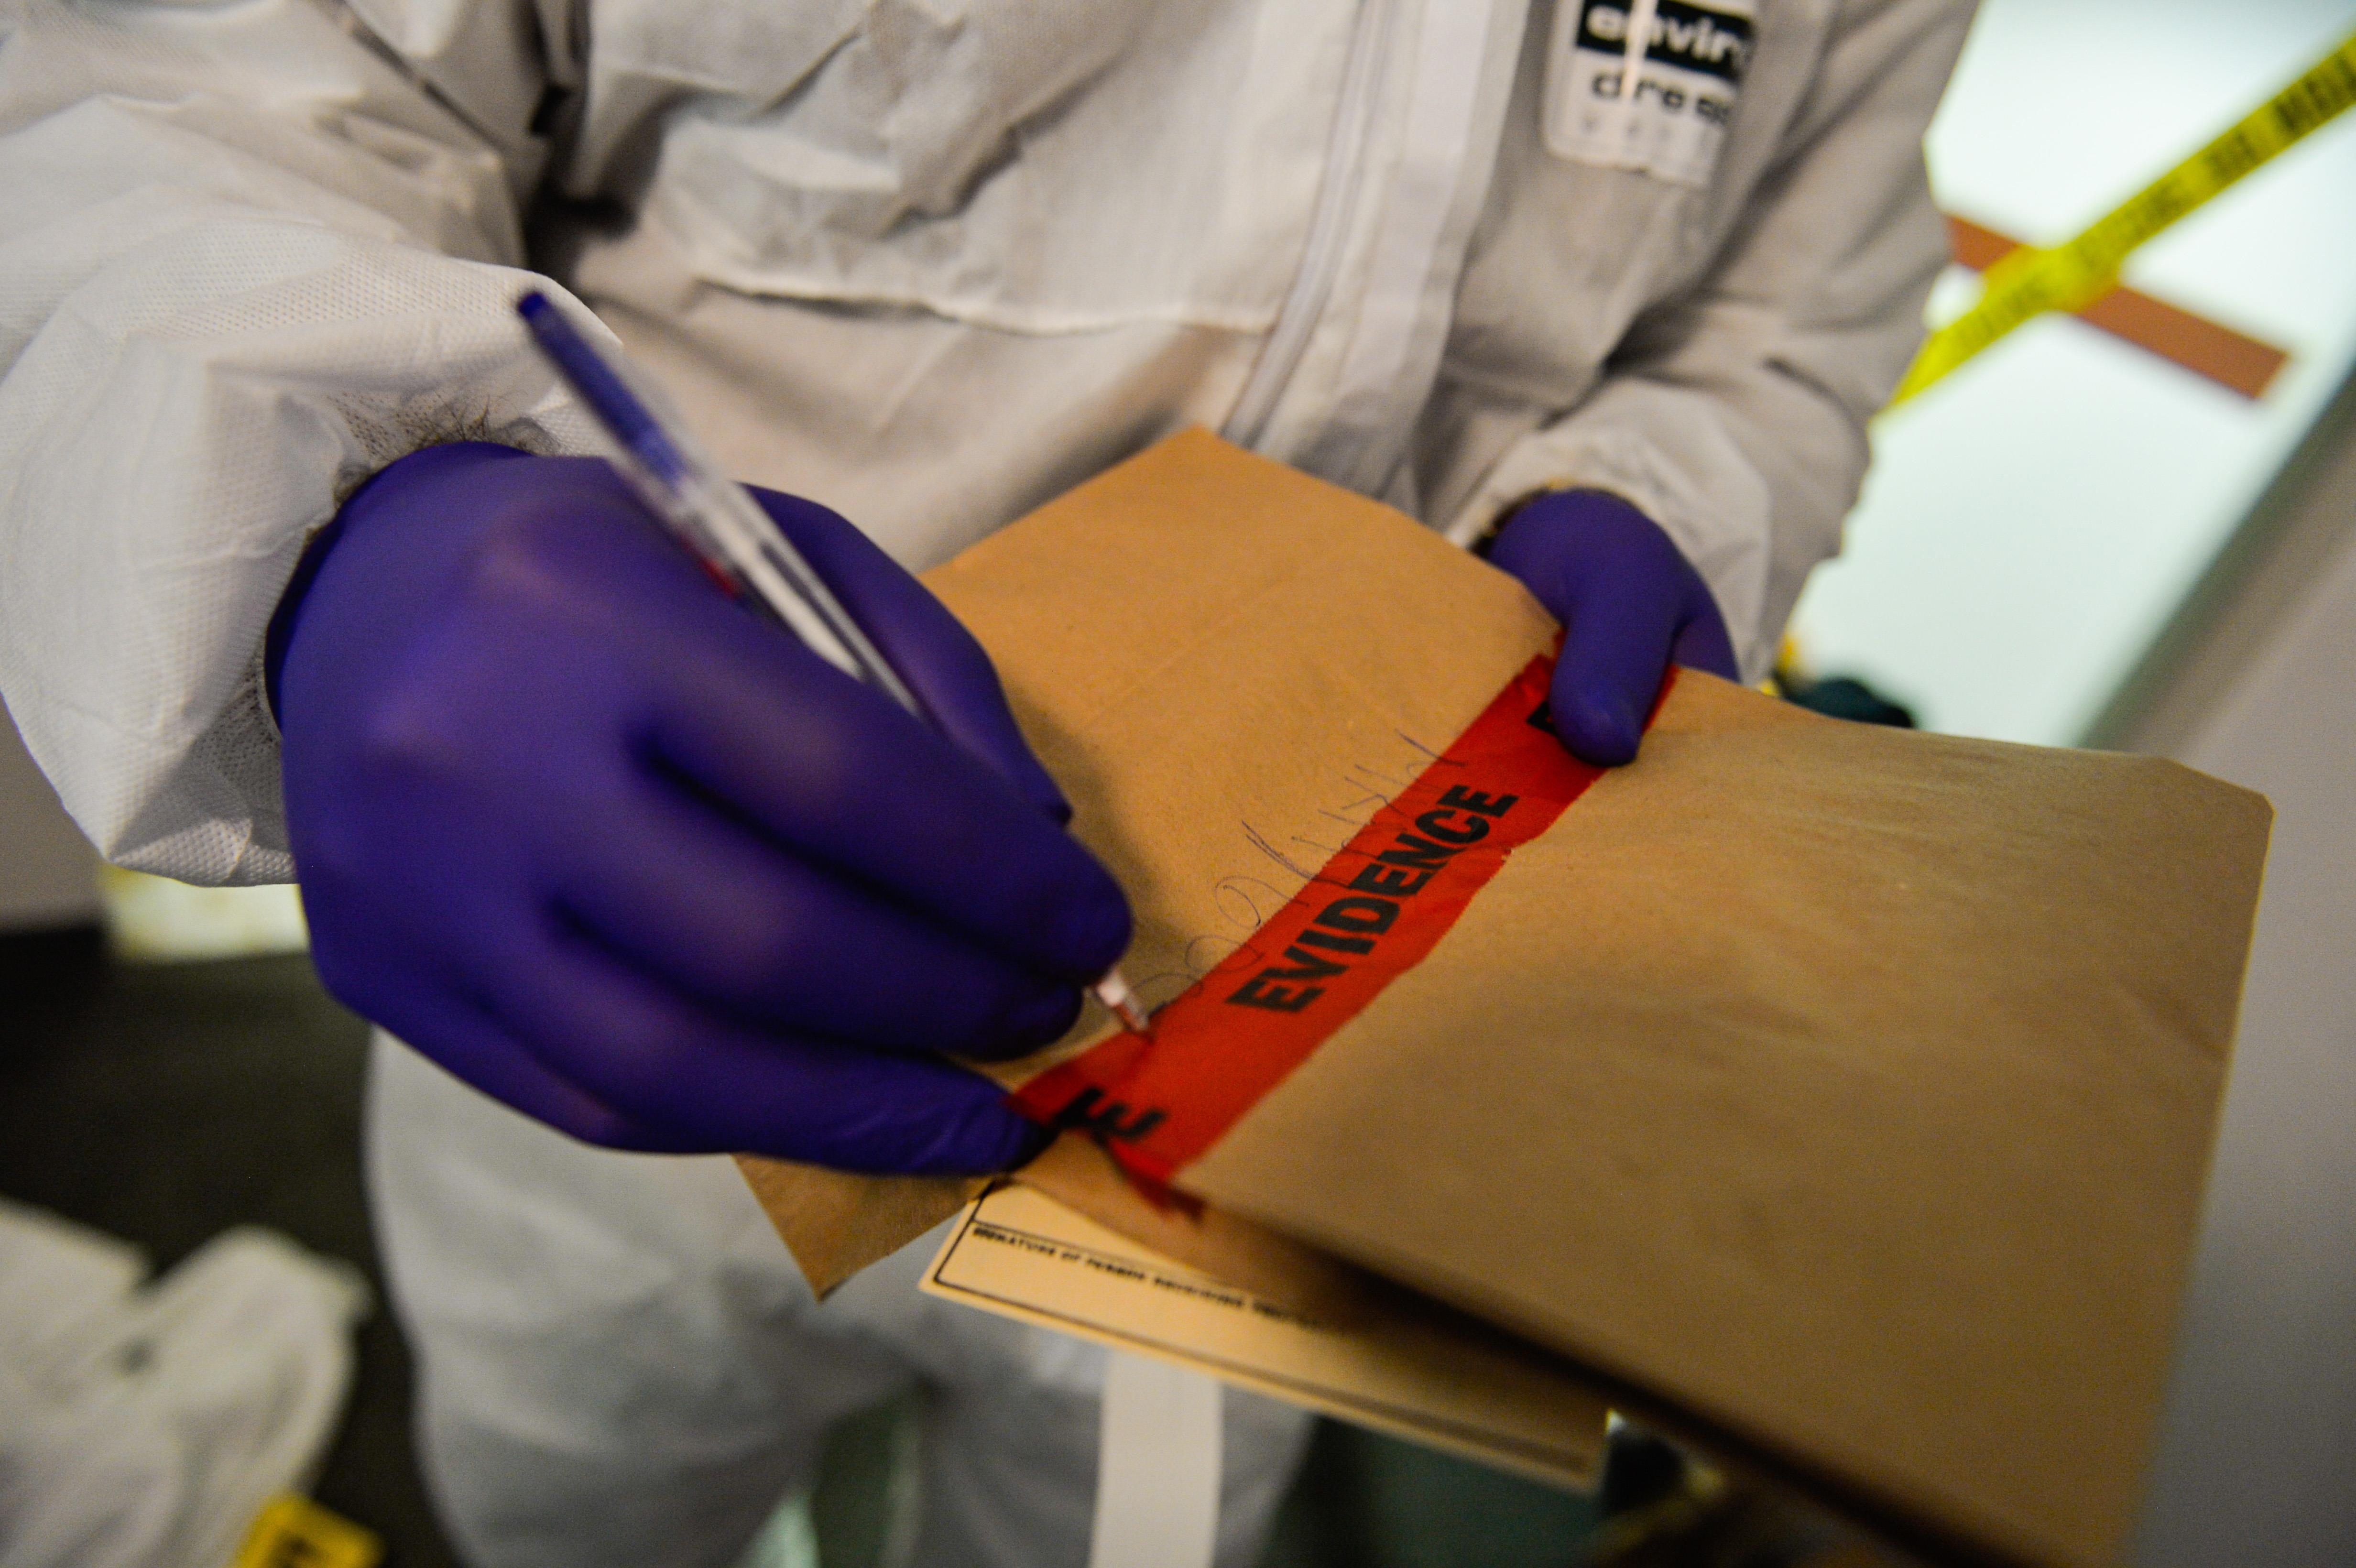 USAFE facilitators surprise AFOSI agents with mock crime scene